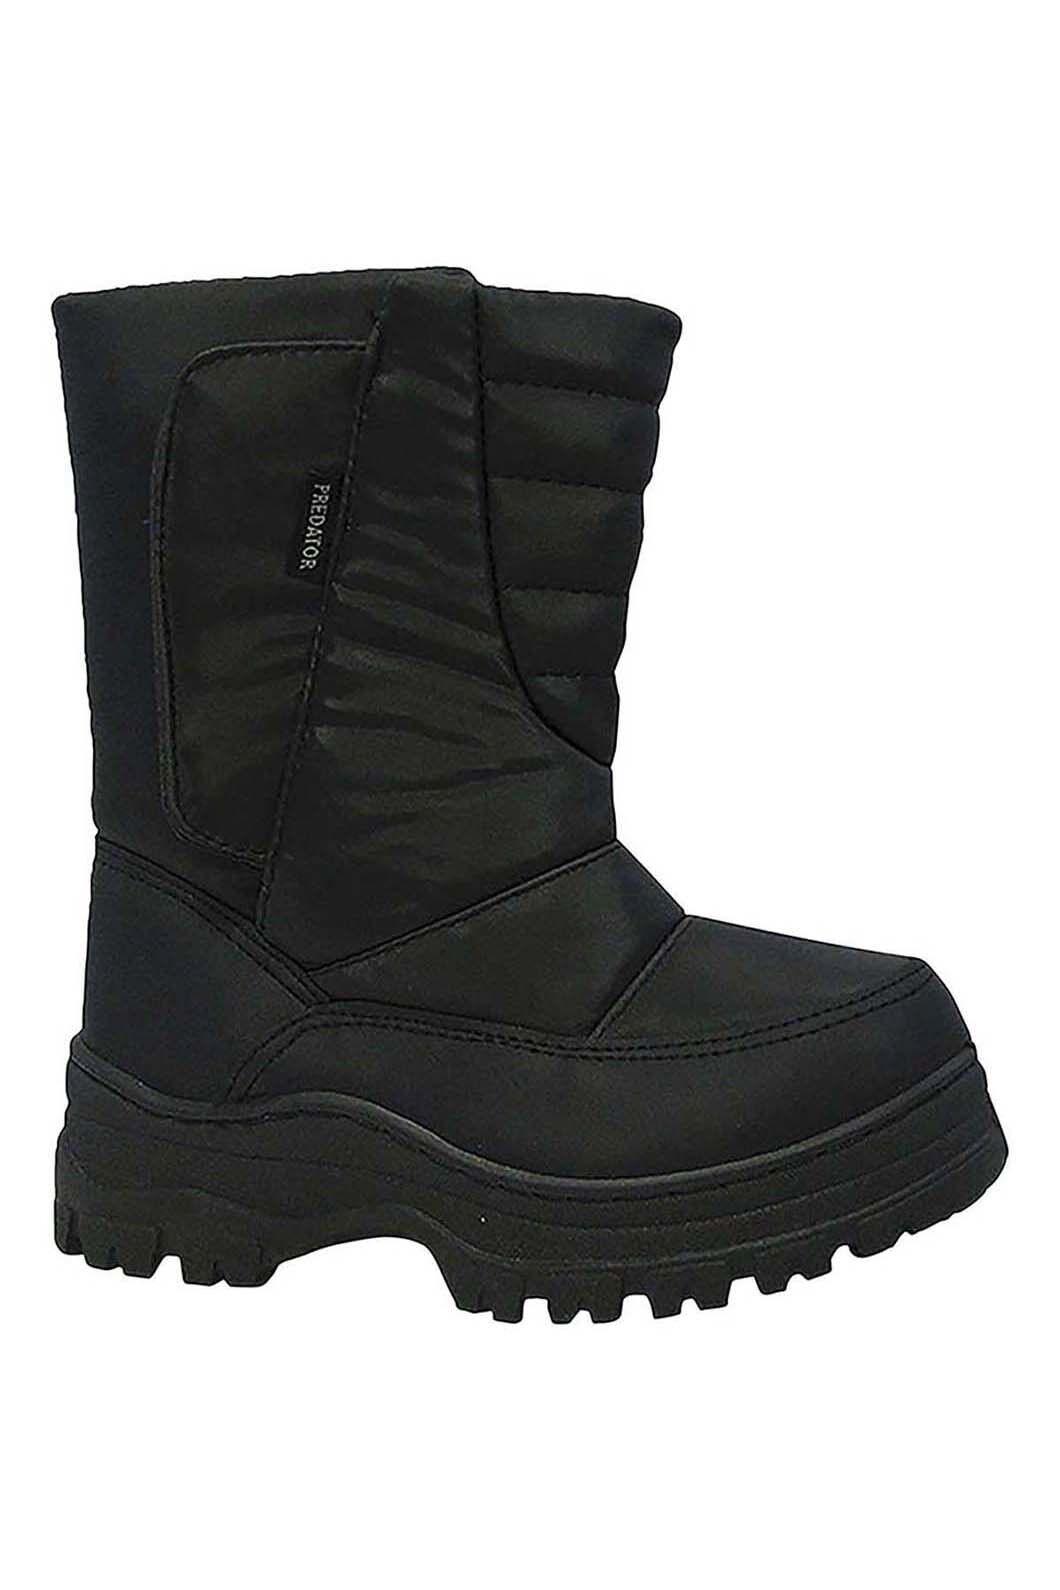 XTM Kids' Pator Snow Boots5-26, Black, hi-res